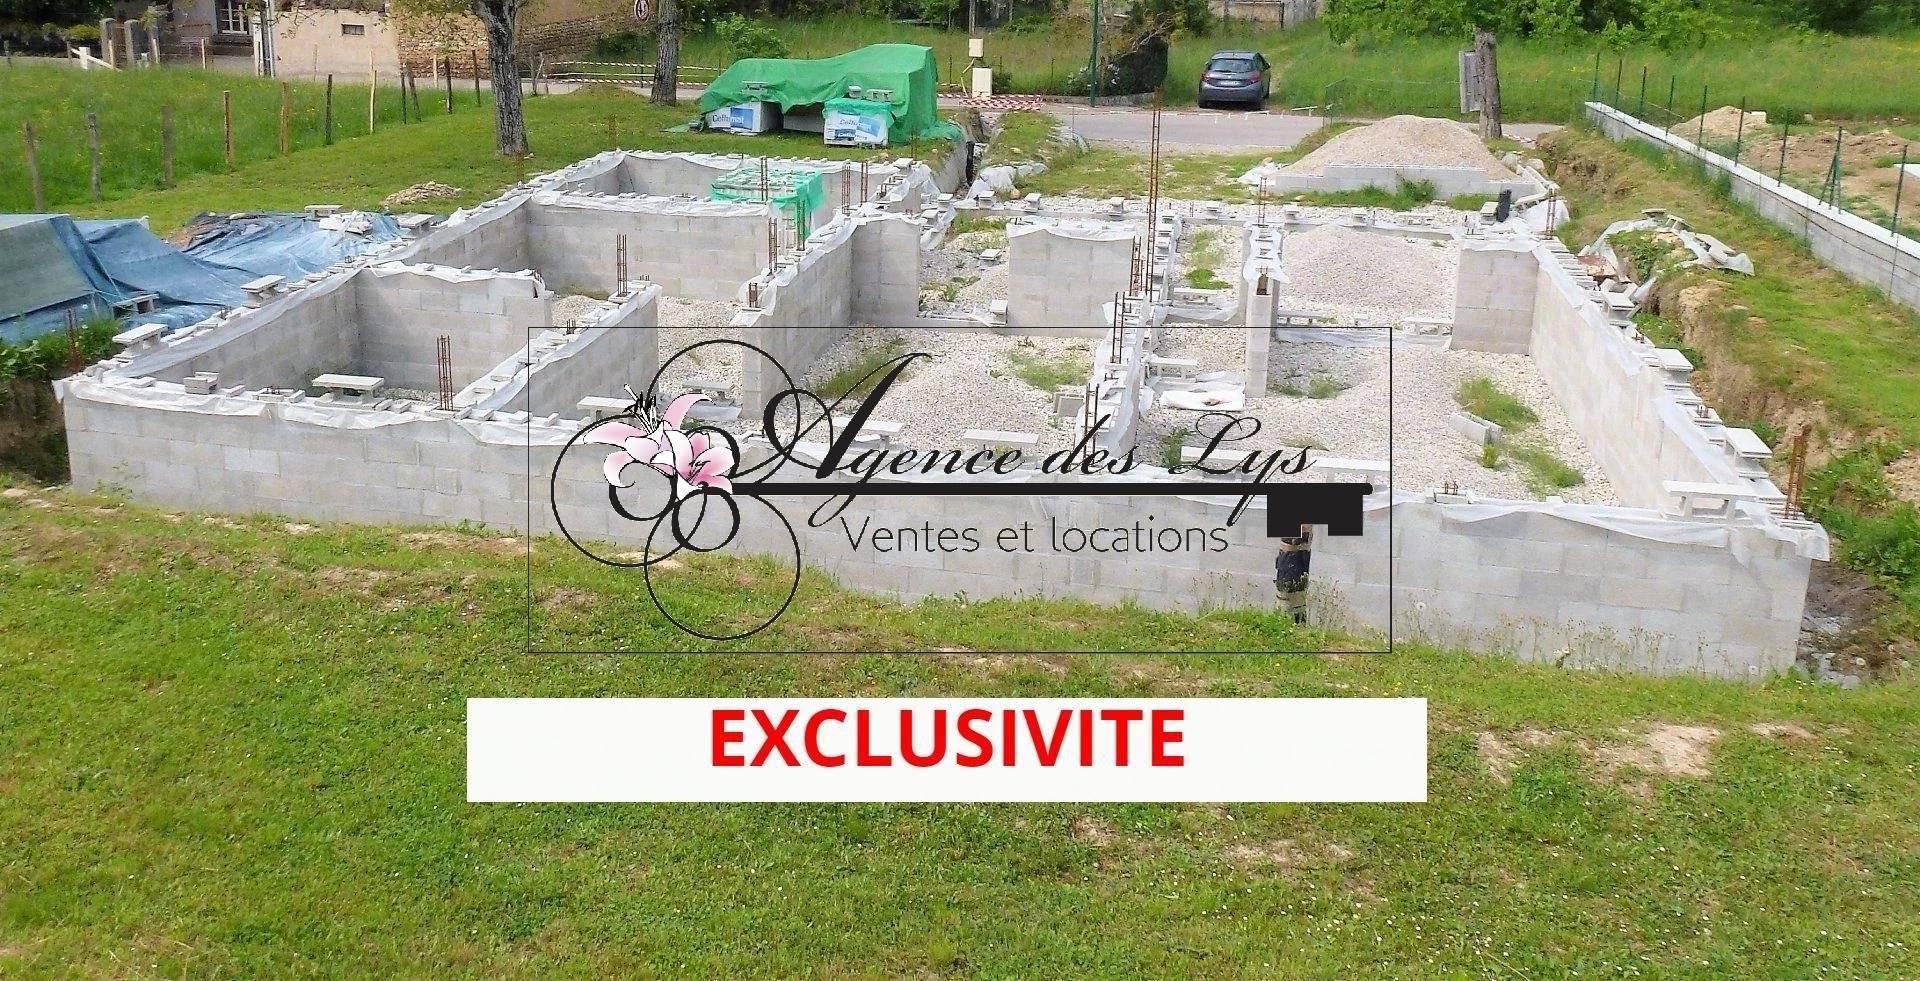 1 46 Saint-Geoirs